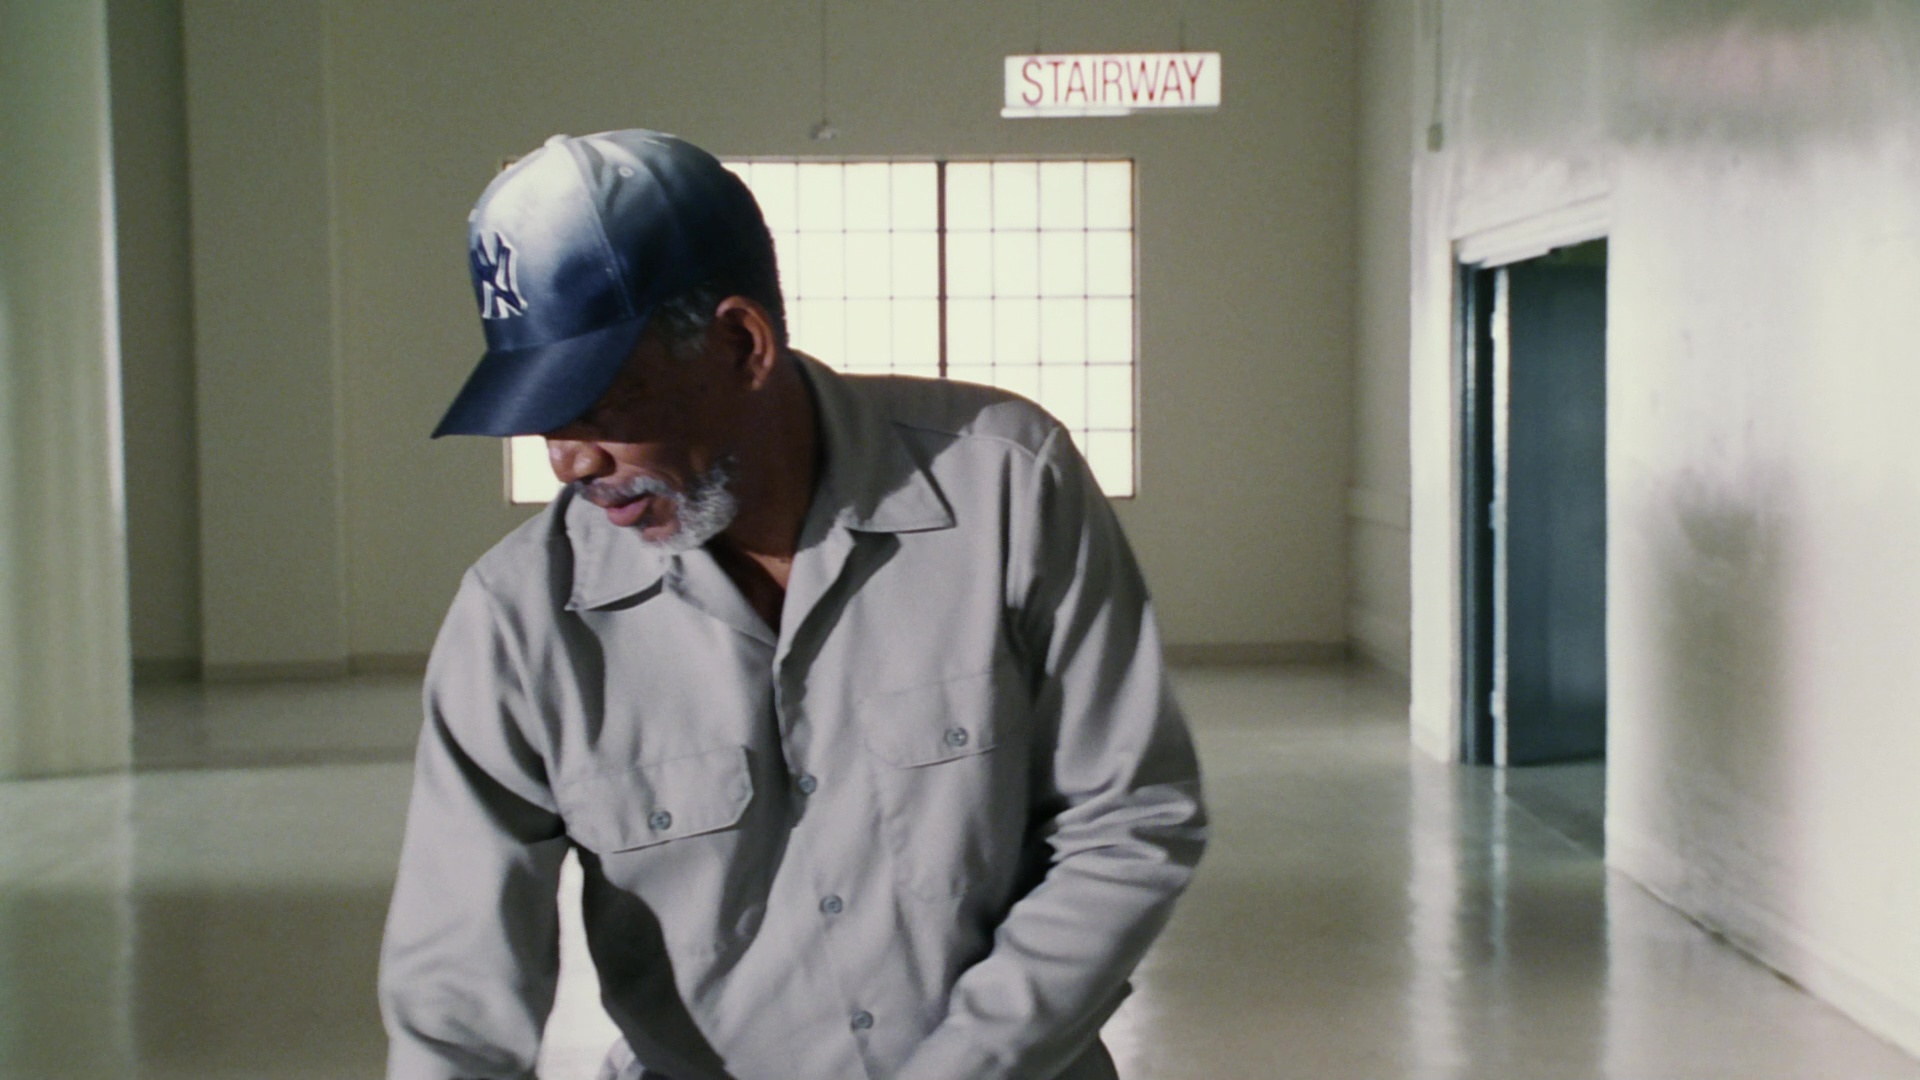 New York Yankees Baseball Team Cap Worn By Morgan Freeman